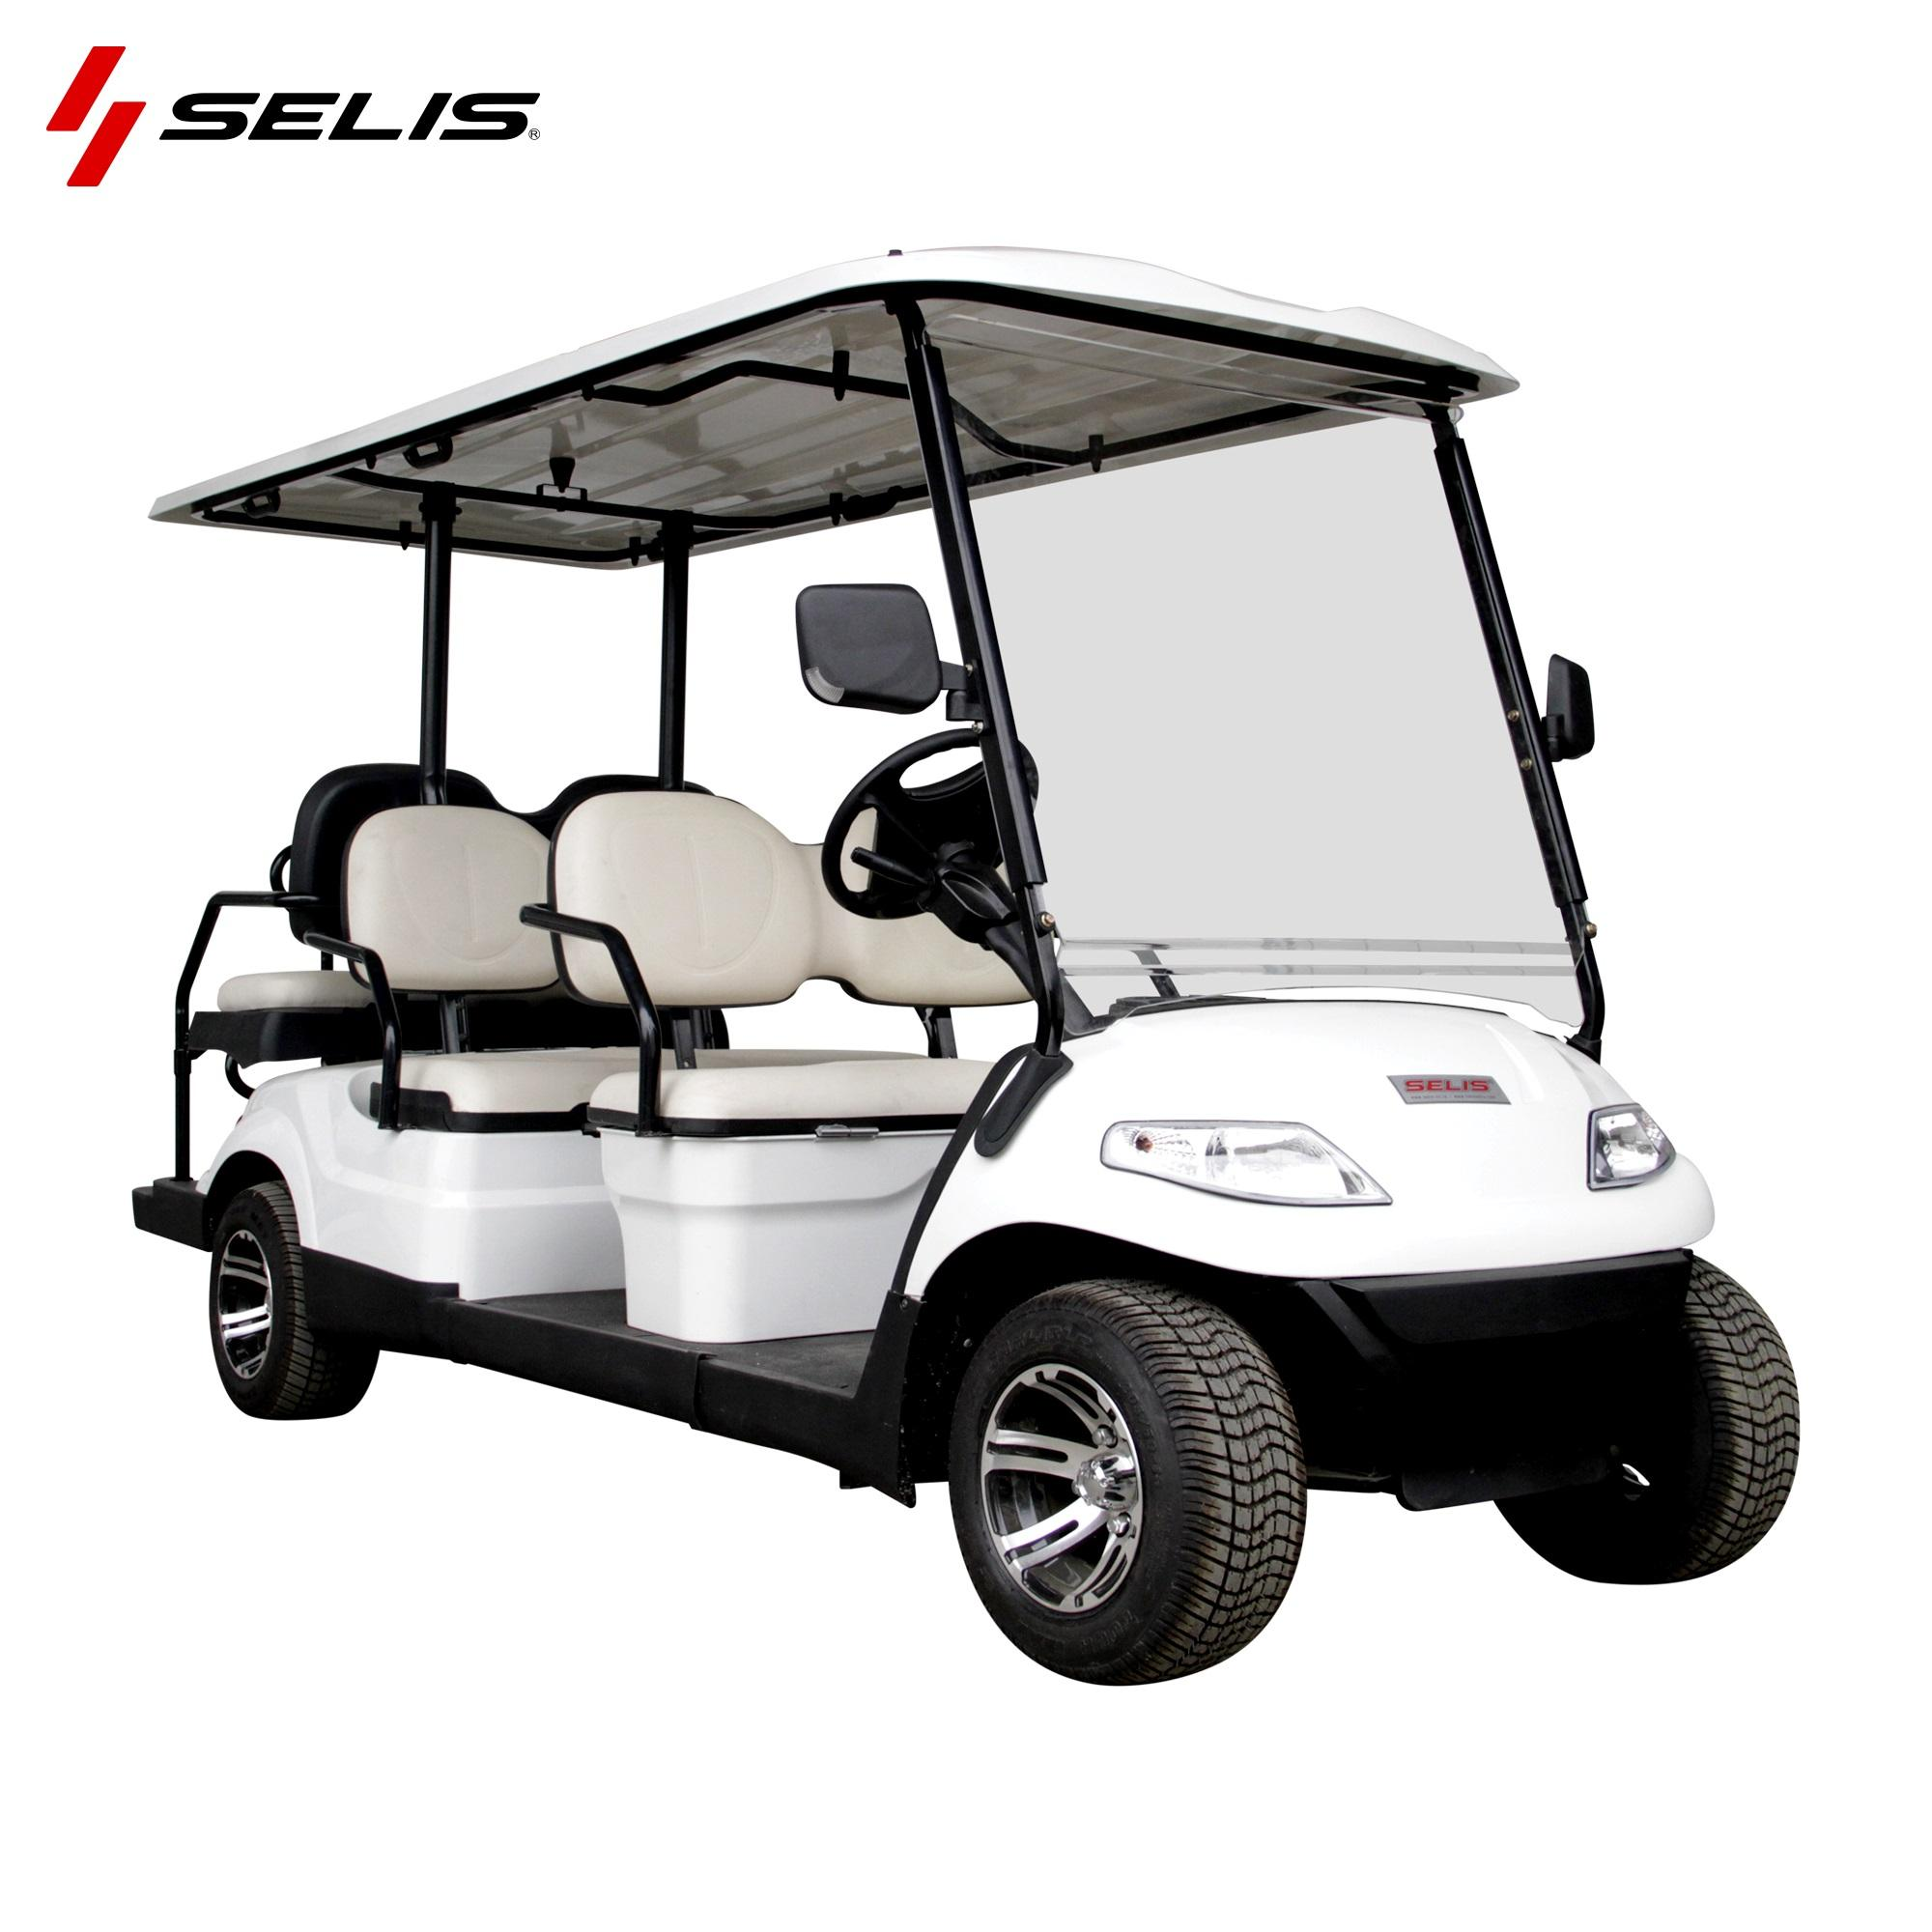 SELIS GOLF CART 6 SEAT MOBIL LISTRIK ( JABODETABEK ONLY ) 57e835b6d1